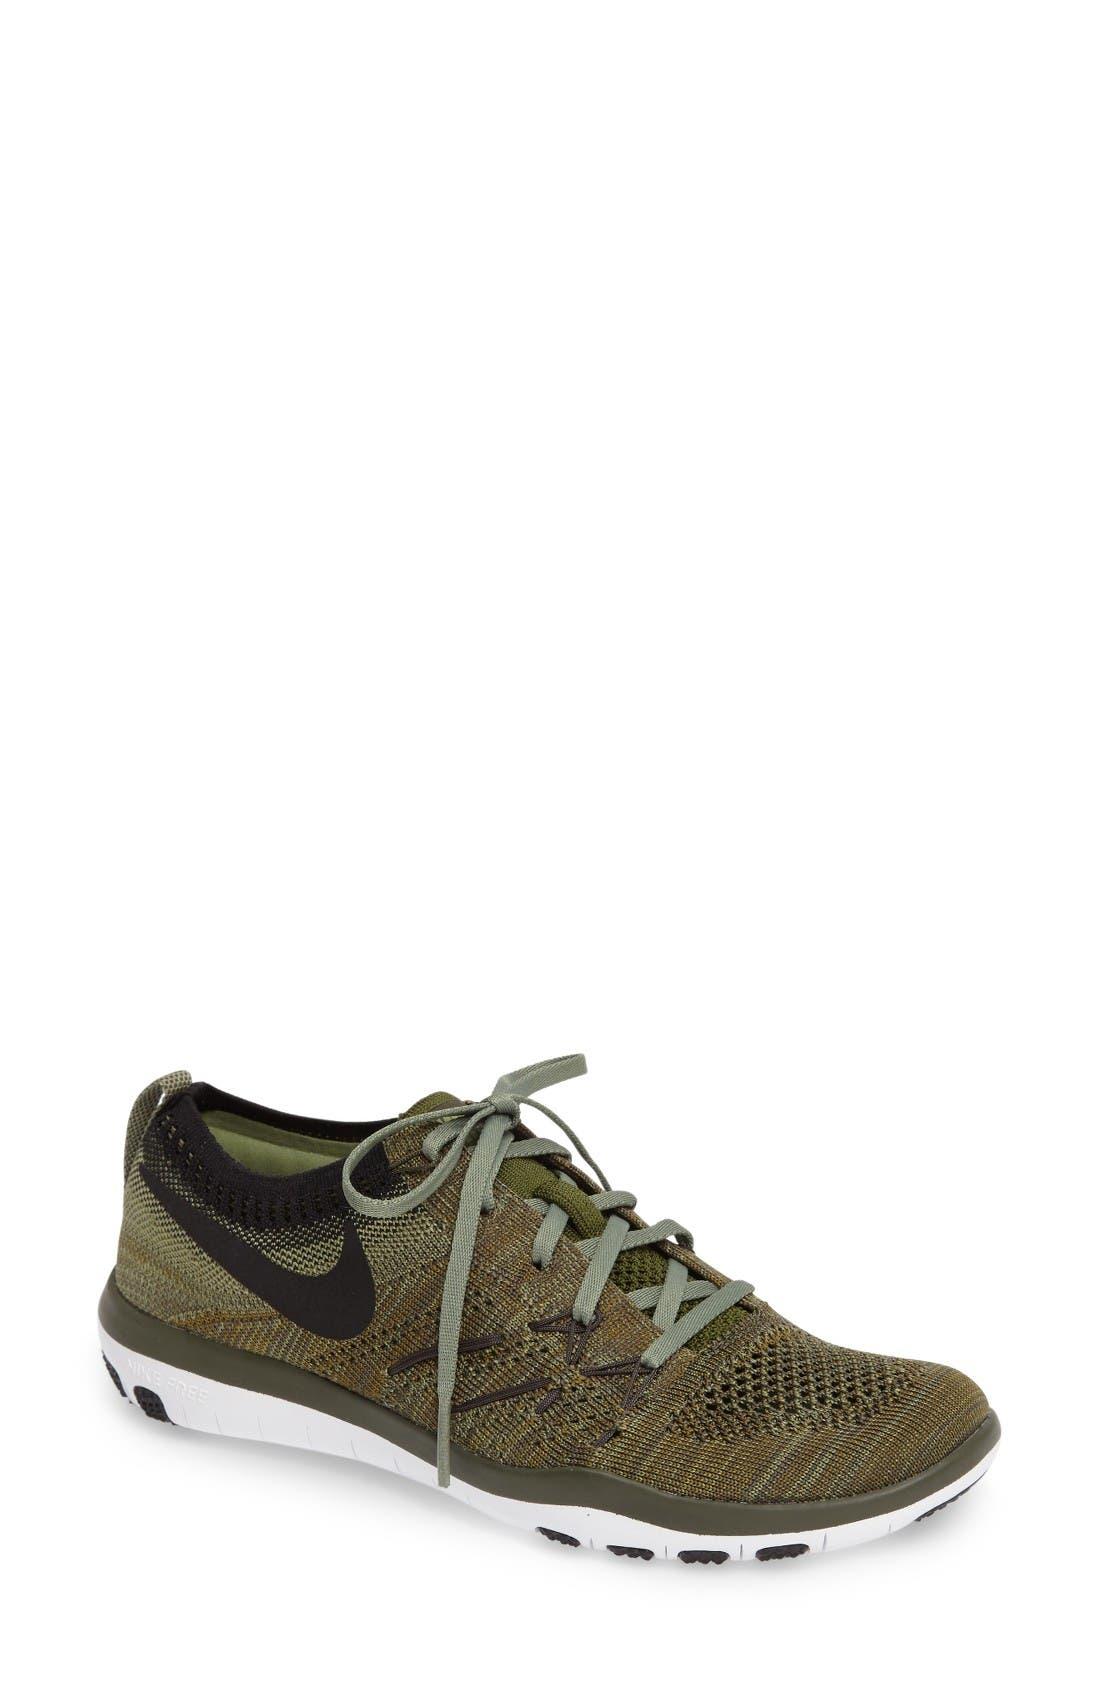 Main Image - Nike 'Free TR Focus Flyknit' Training Shoe (Women)